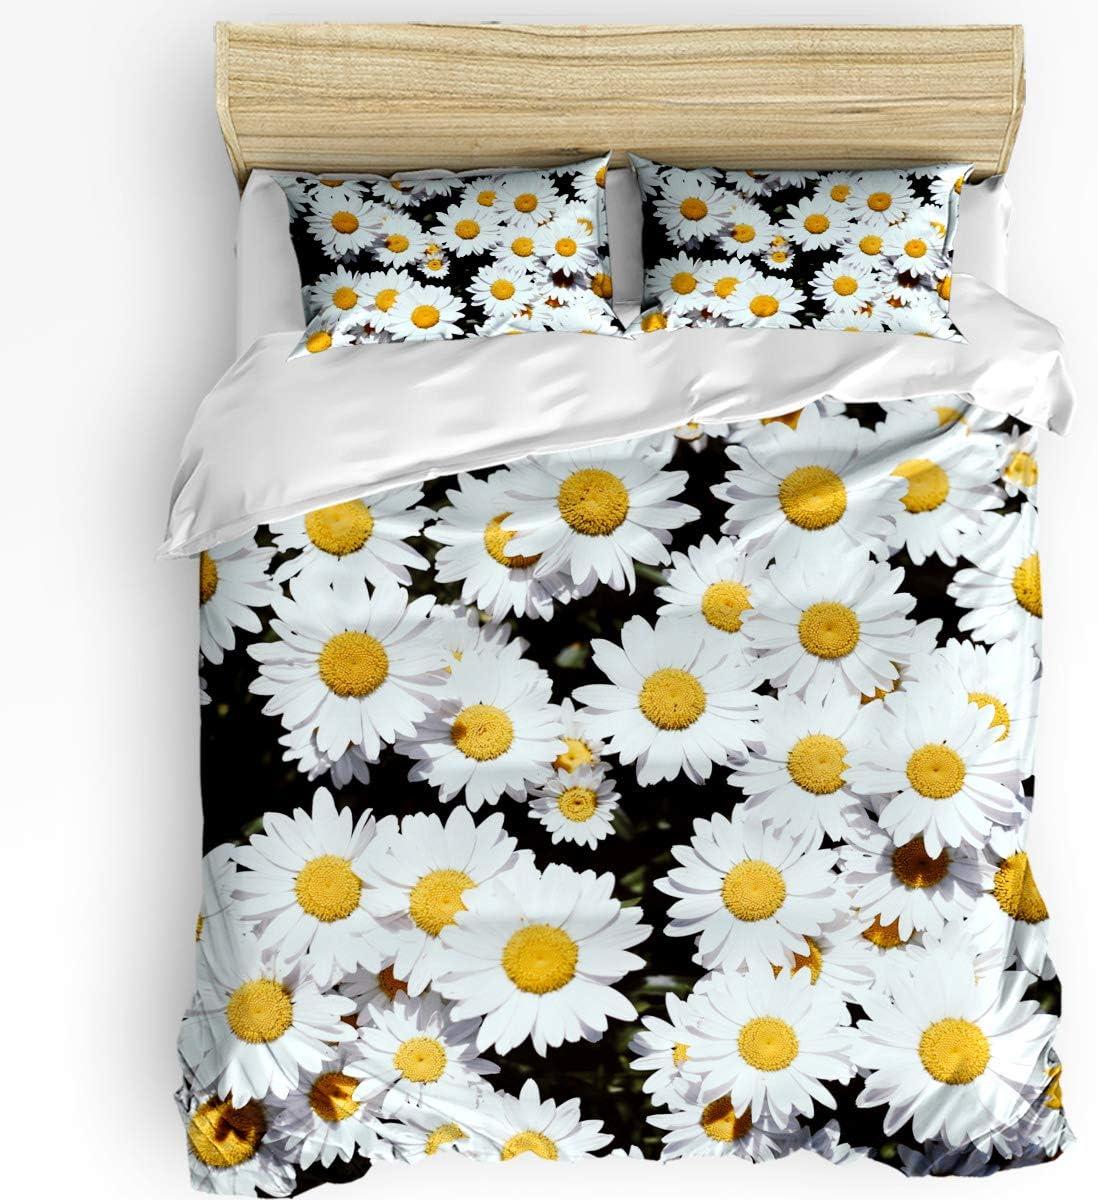 USOPHIA 3pc King Duvet Cover Set 贈物 Daisy Yellow White Daisies Flo お求めやすく価格改定